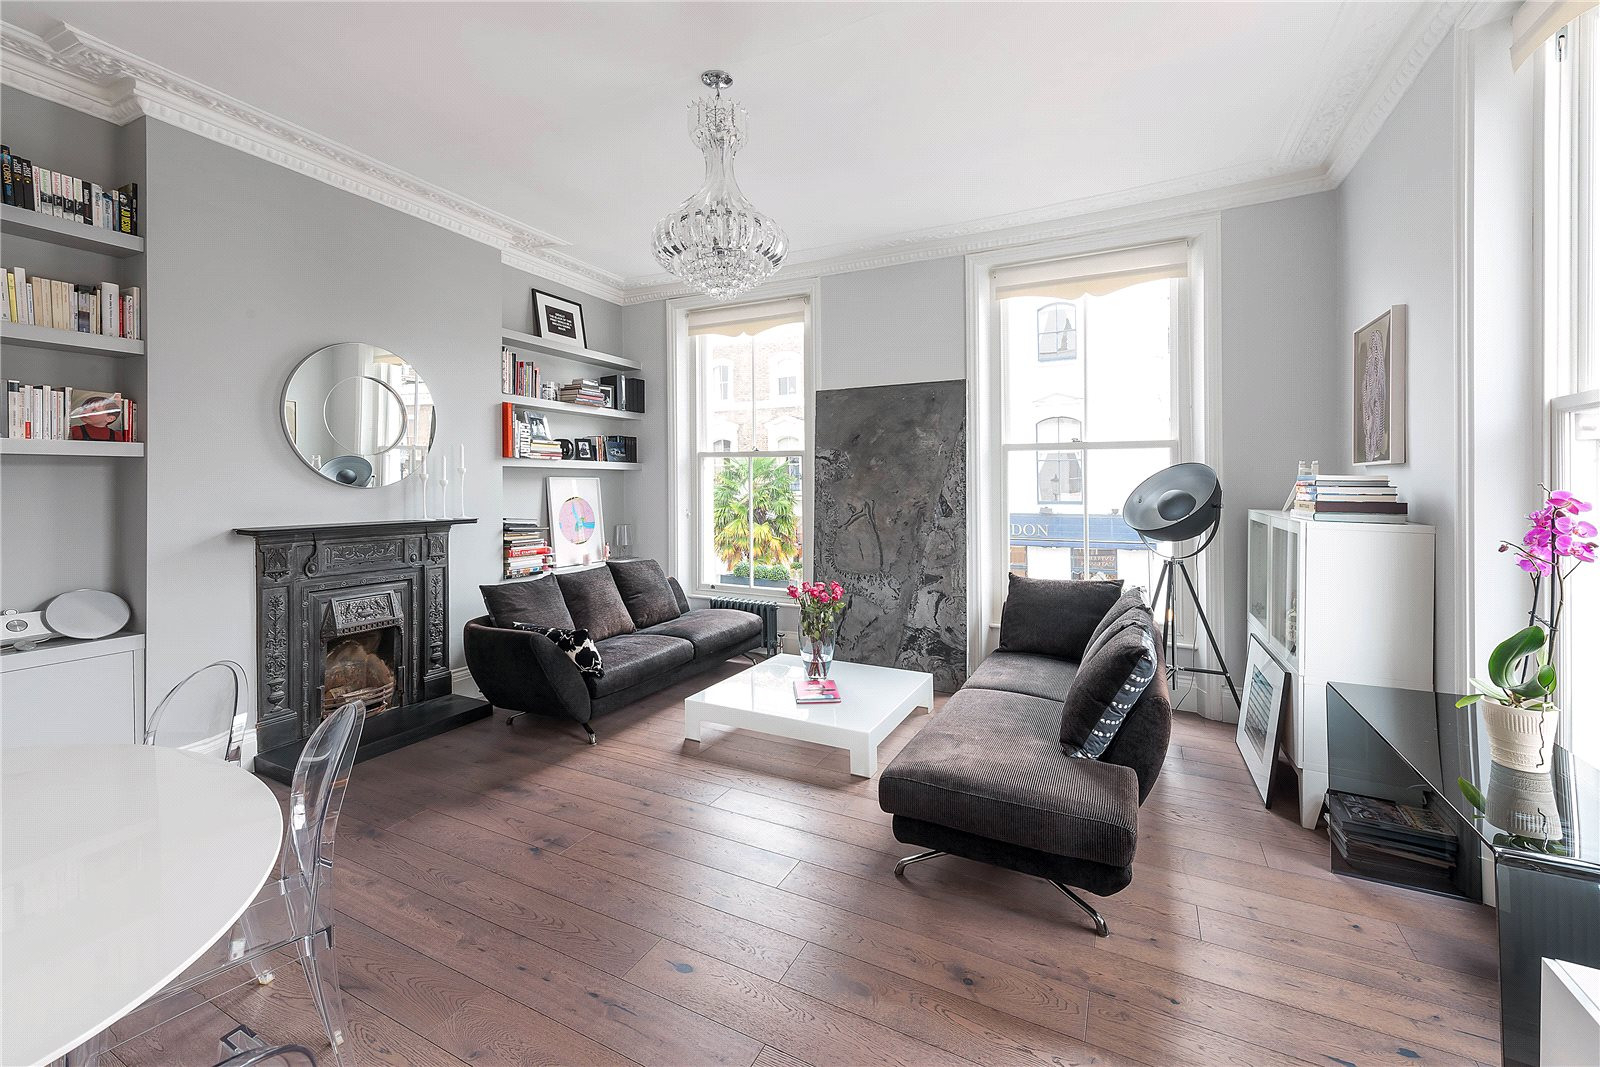 Apartamento por un Venta en Abingdon Road, Kensington, London, W8 Kensington, London, Inglaterra